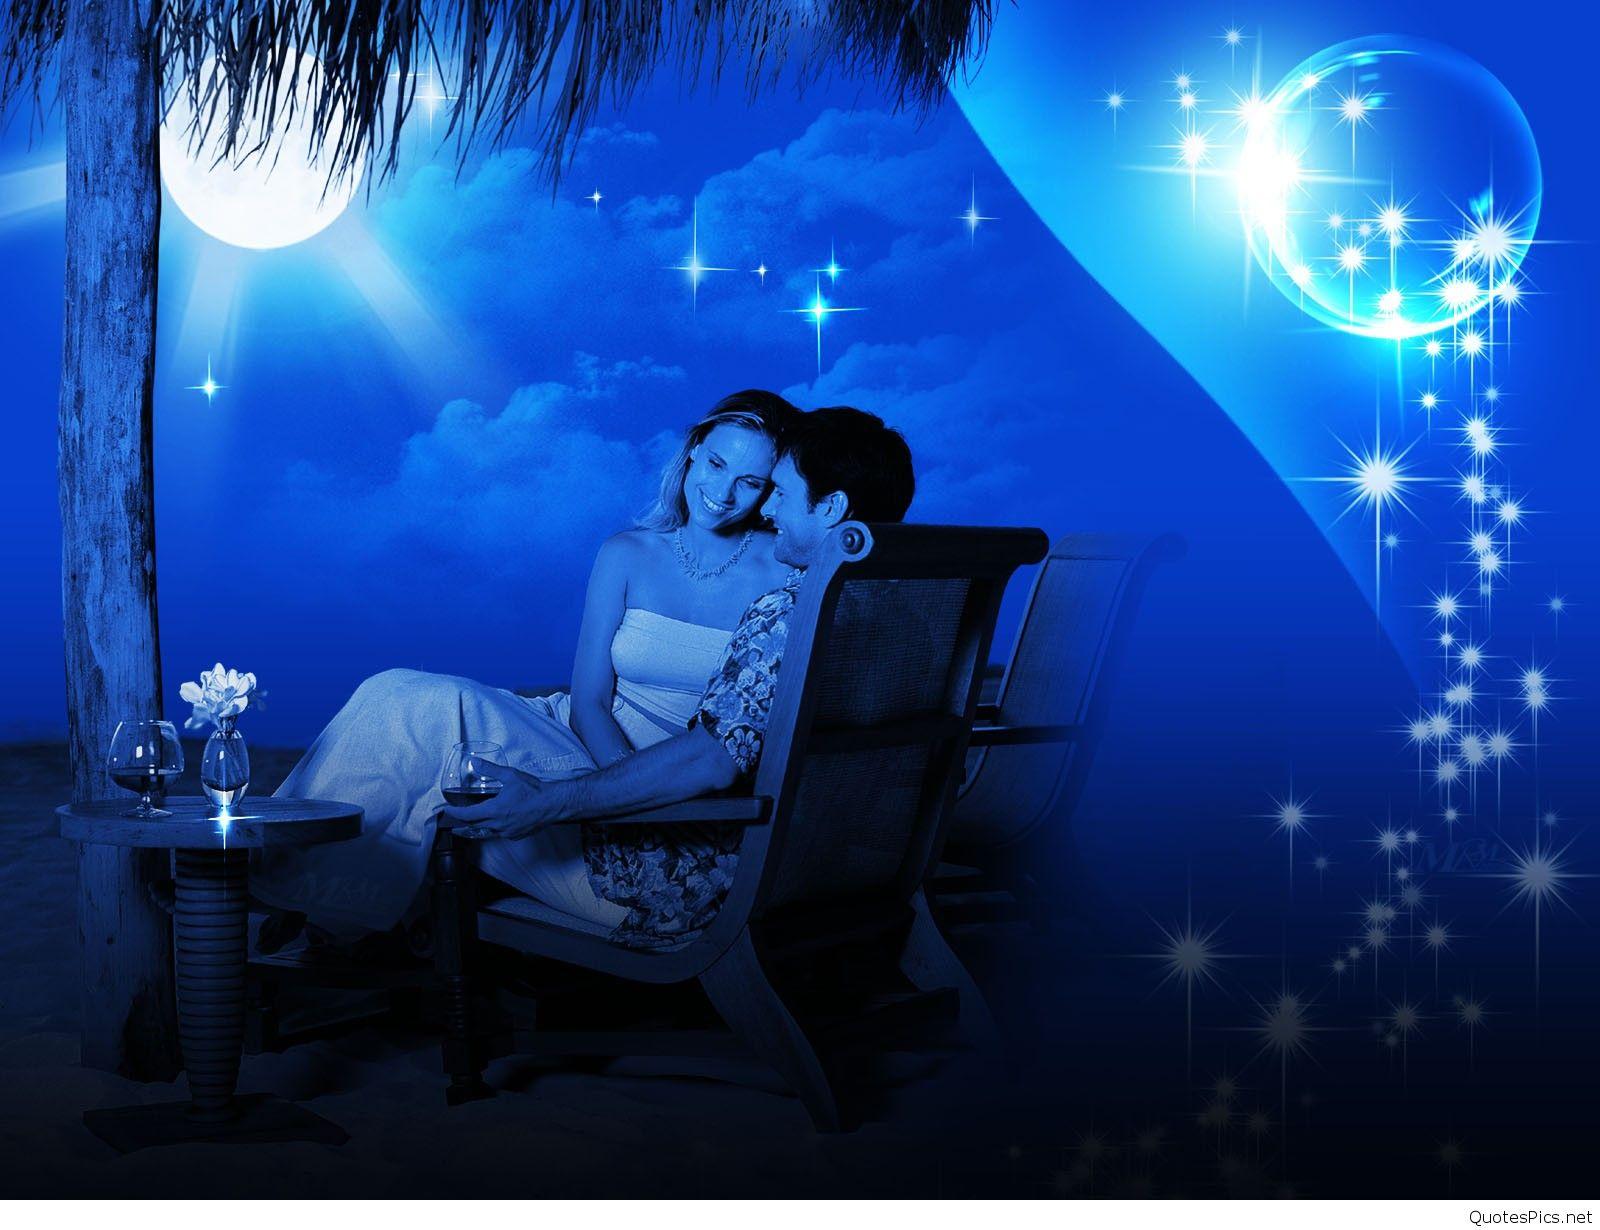 Love Romantic Valentine S Day Theme Illustrator Wallpaper 1600x1230